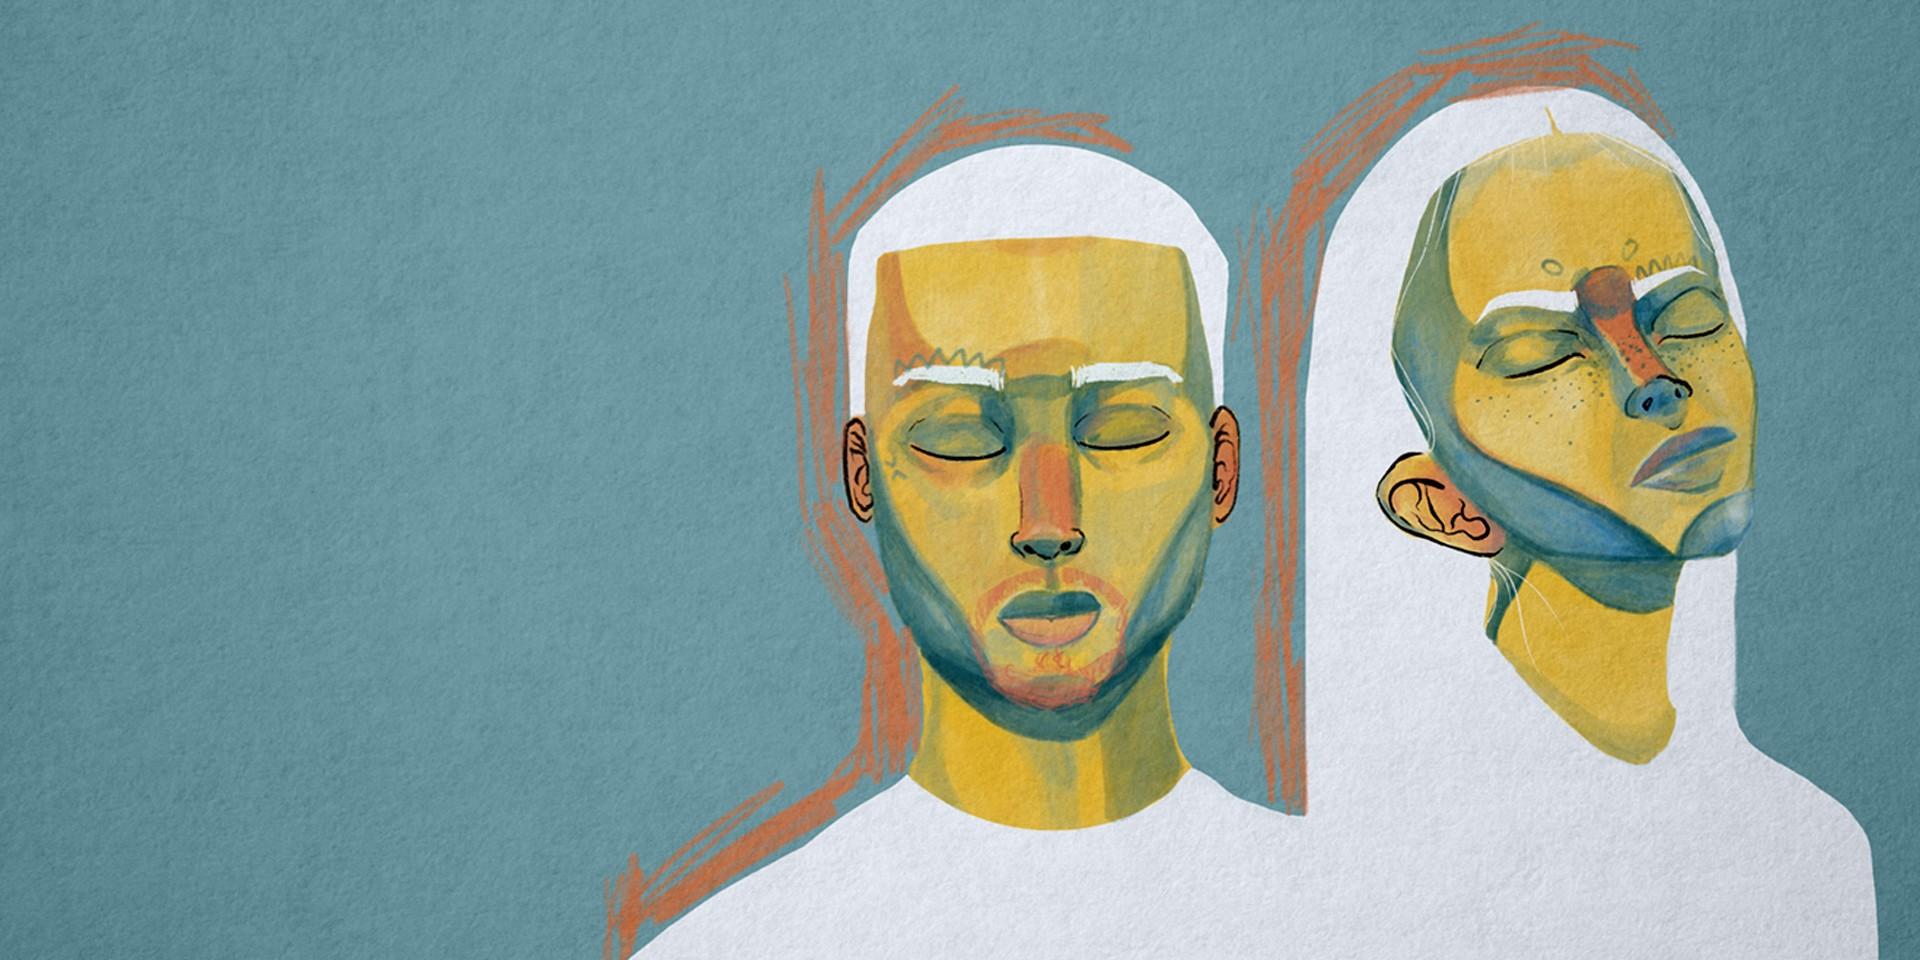 Emir Hermono, VVYND, and Erik Soto team up for new single, 'Next To Me' – listen